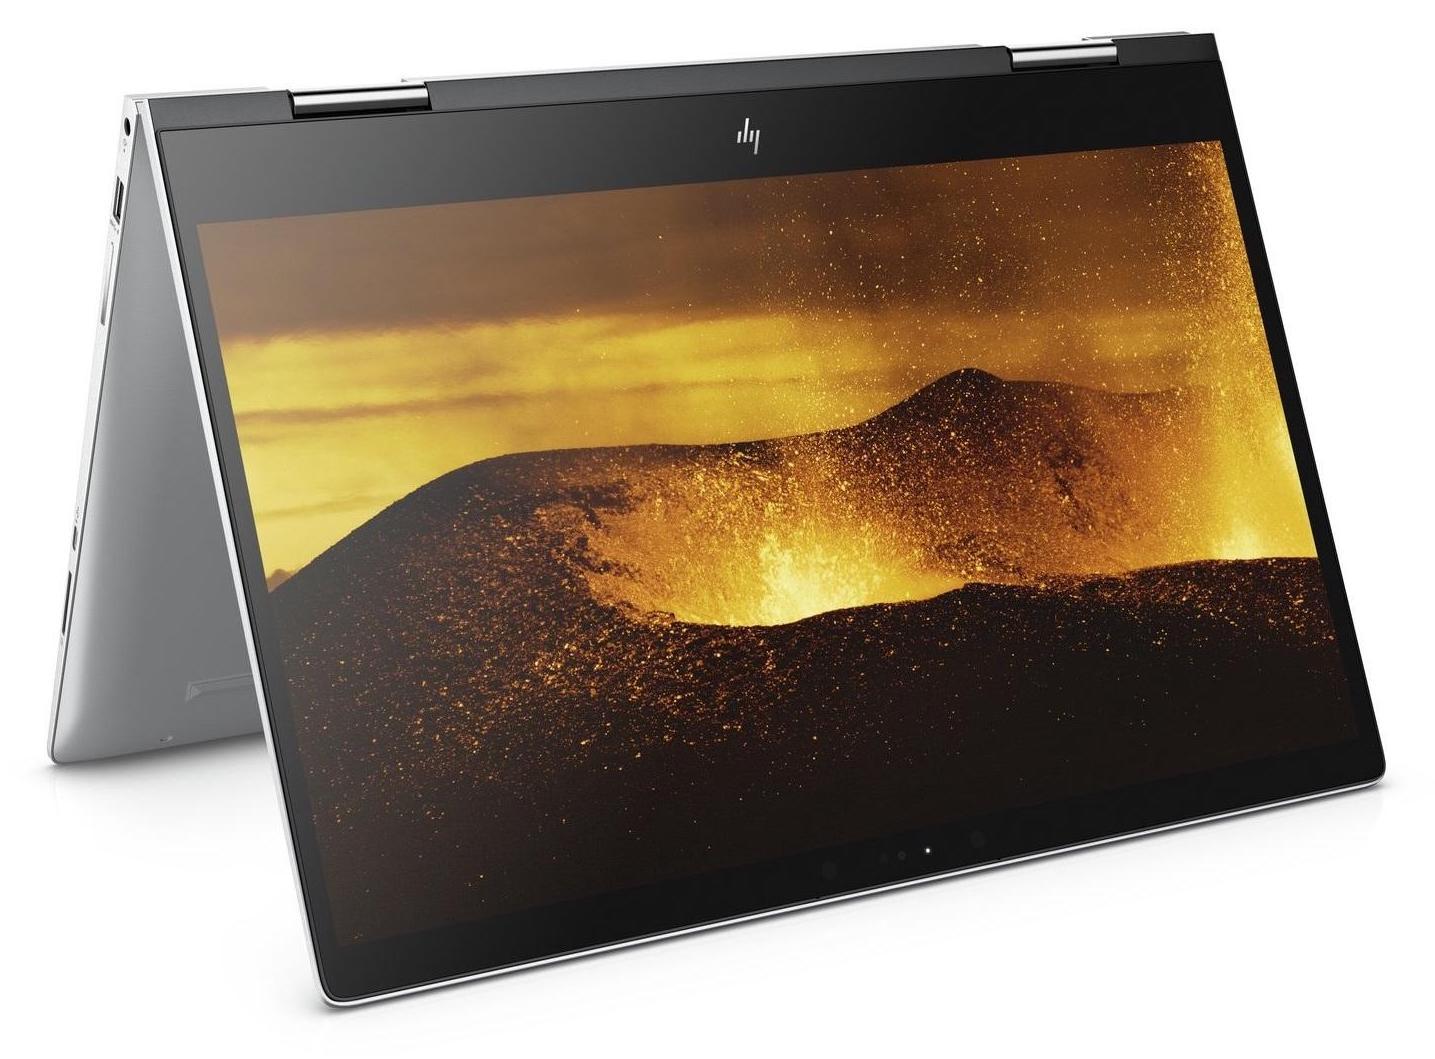 "HP Envy x360 15-bp119nf, ultrabook 15"" tablette i7 Refresh MX150 SSD256 1330€"